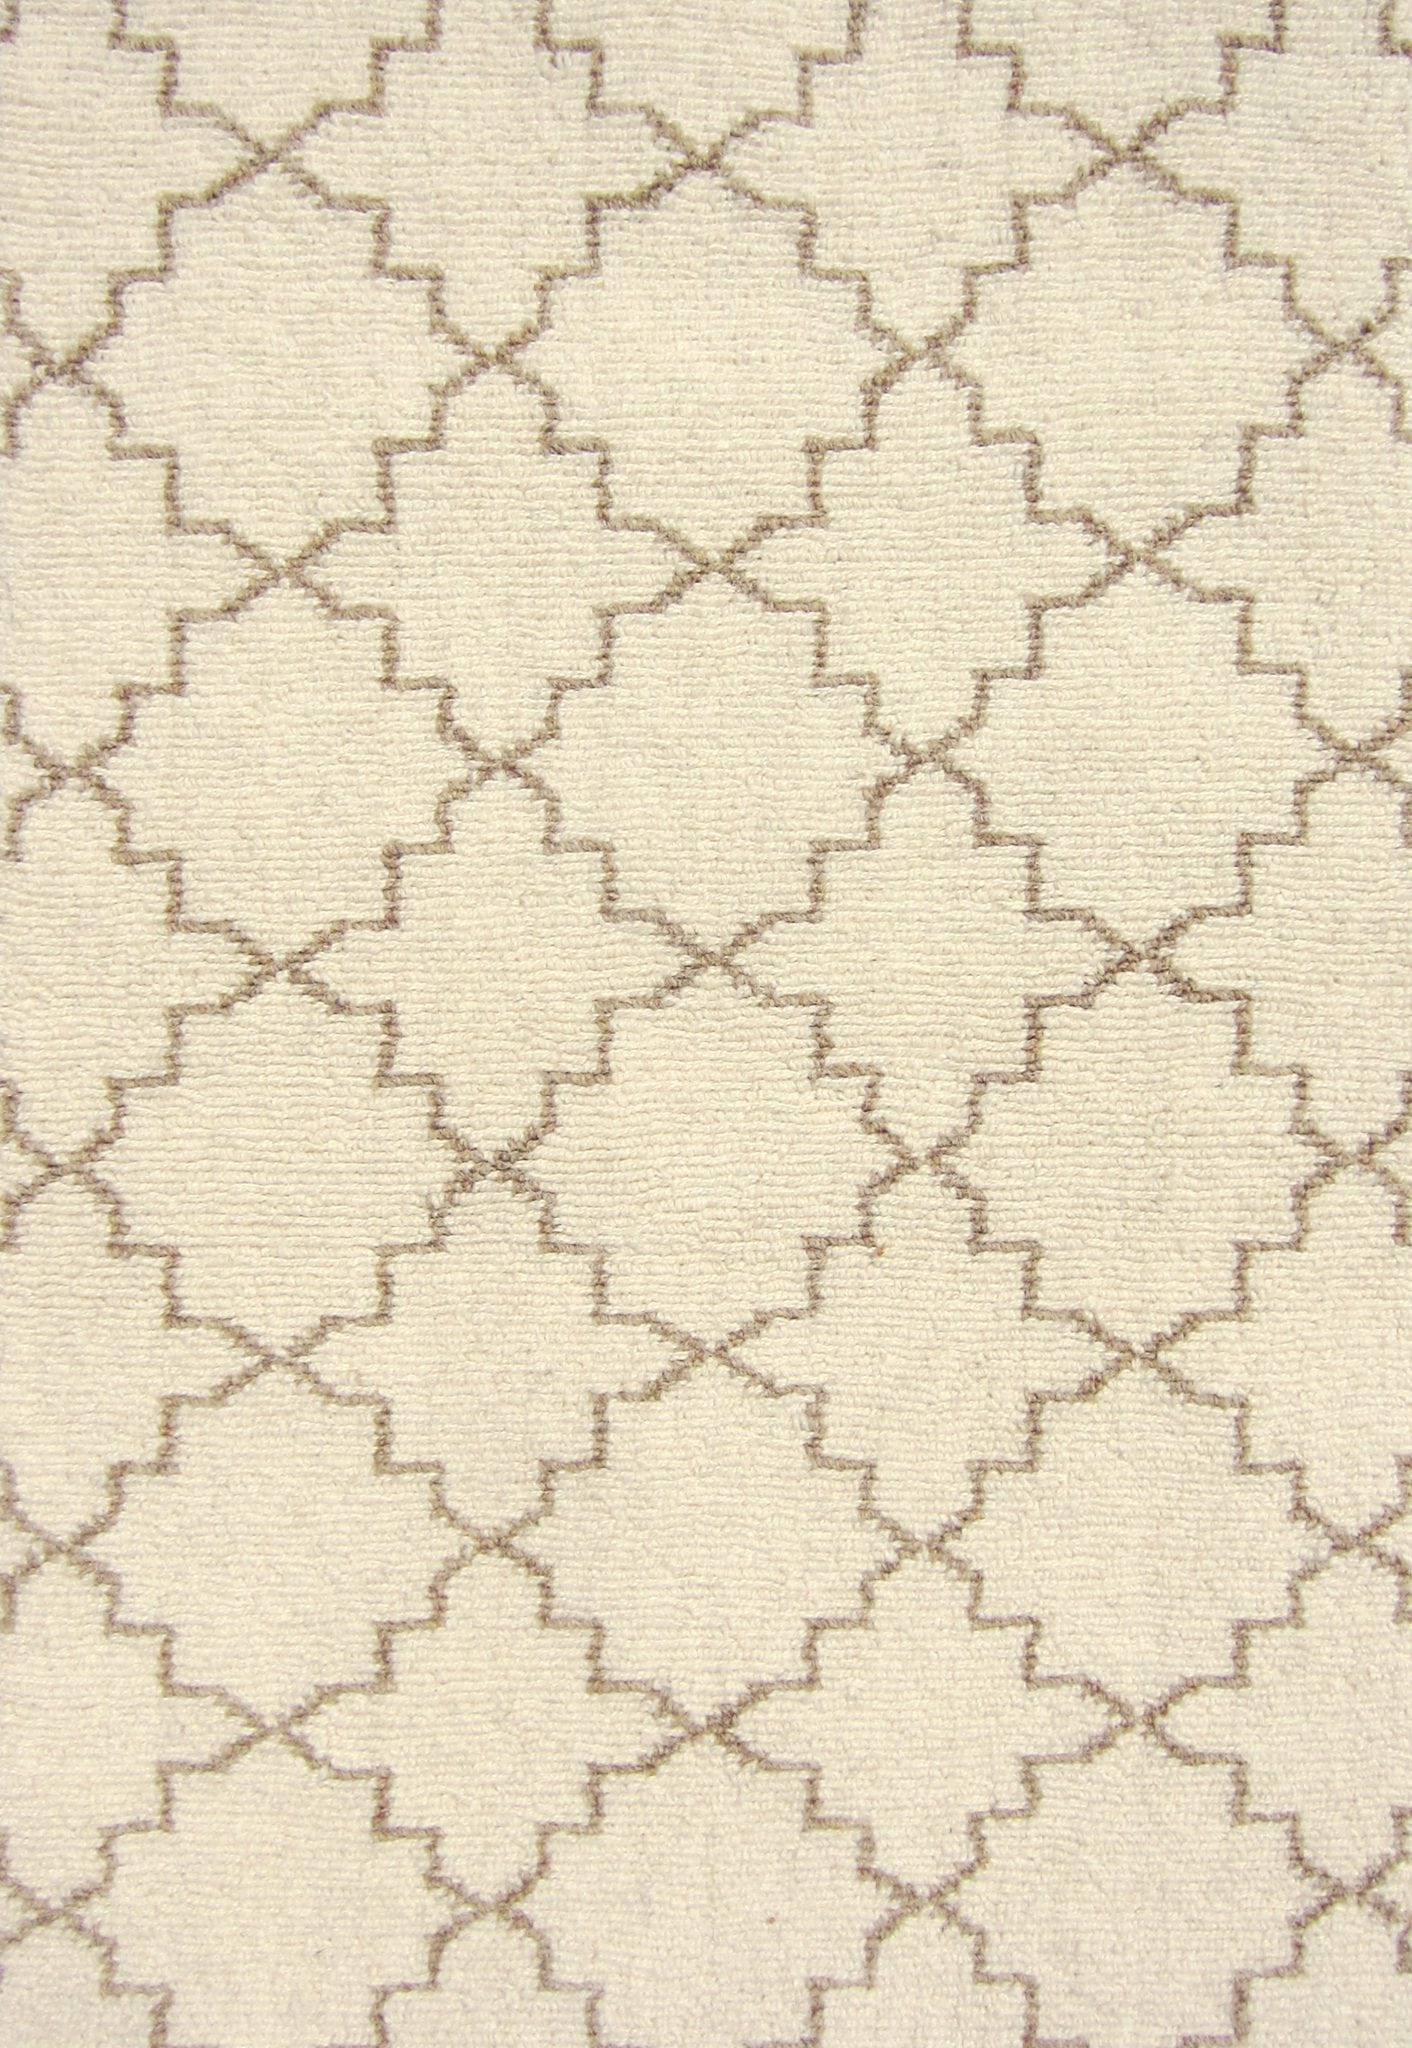 Moroccan Trellis Taupe Wool Loom Hooked Rug